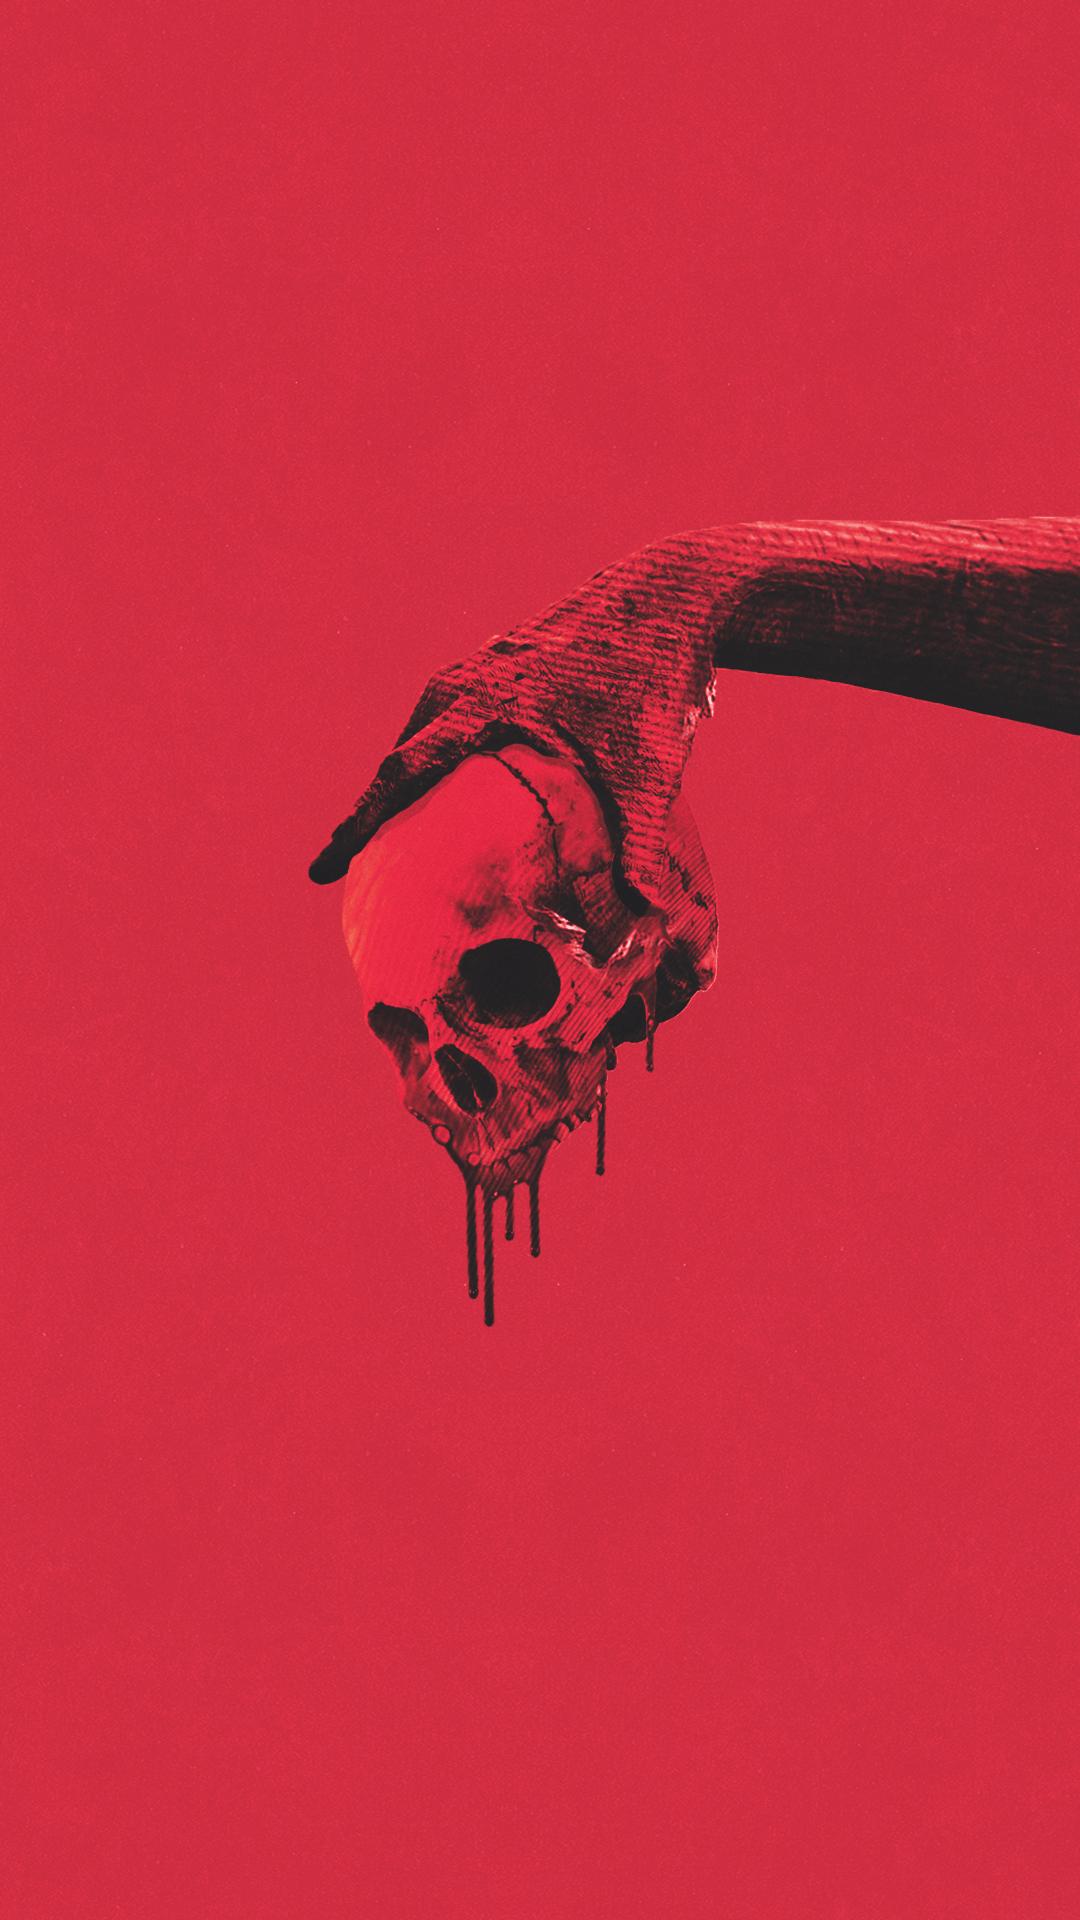 Red Skull Tumblr Wallpapers - Wallpaper ...